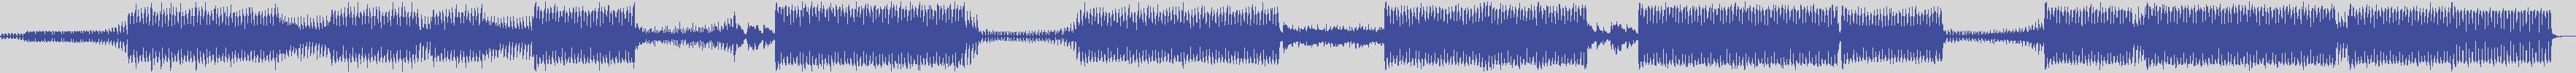 just_digital_records [smile1112] Kabal - Python [Original Mix] audio wave form